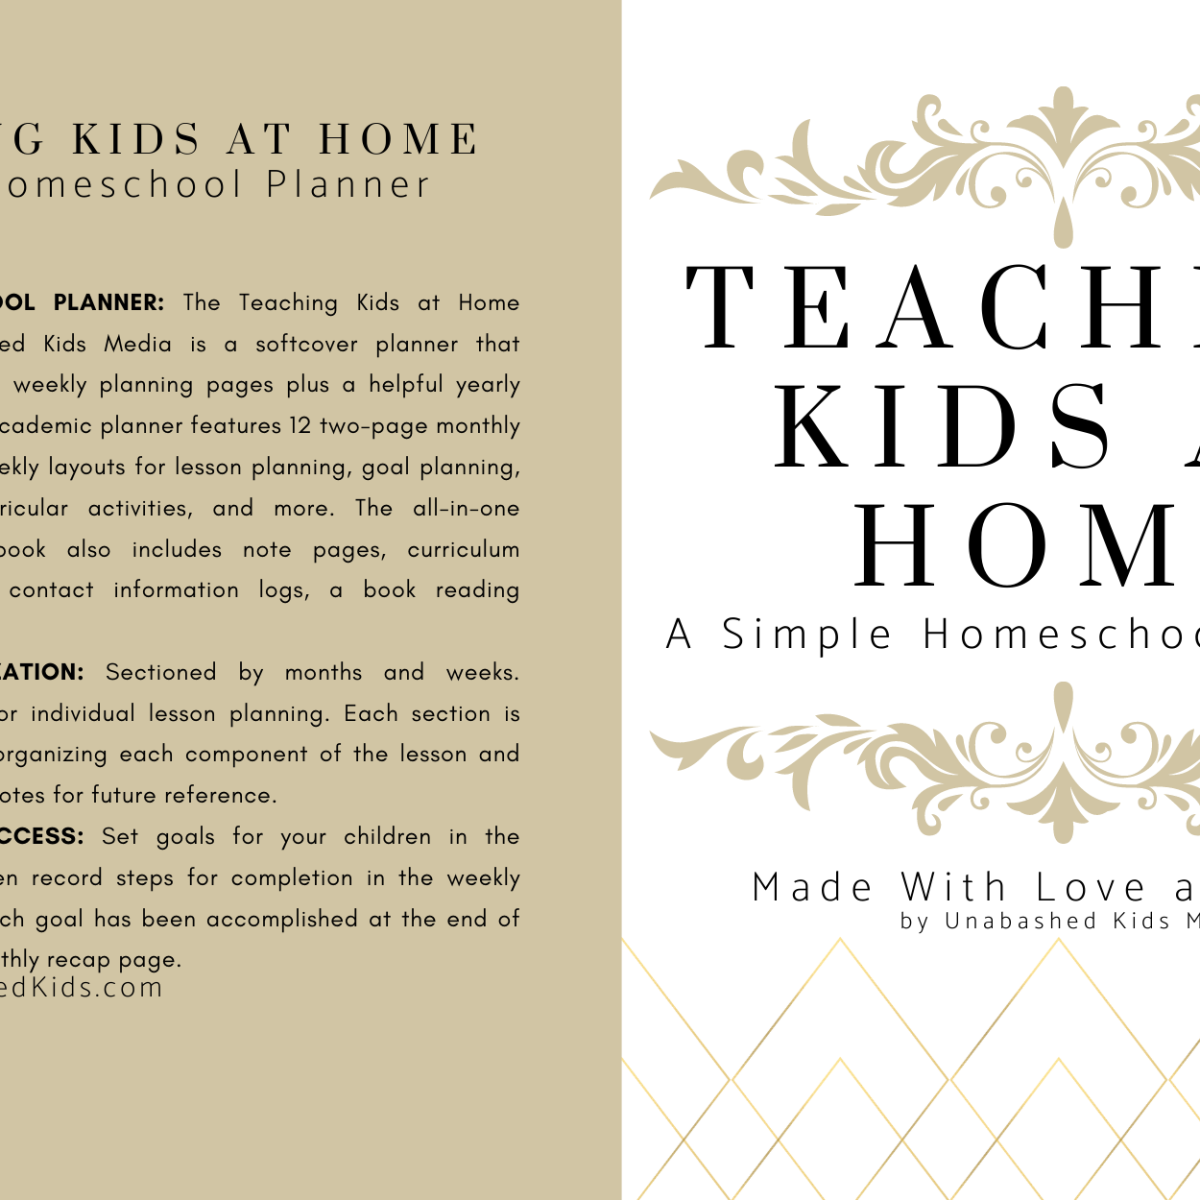 Teaching Kids at Home - A Simple Homeschool Planner